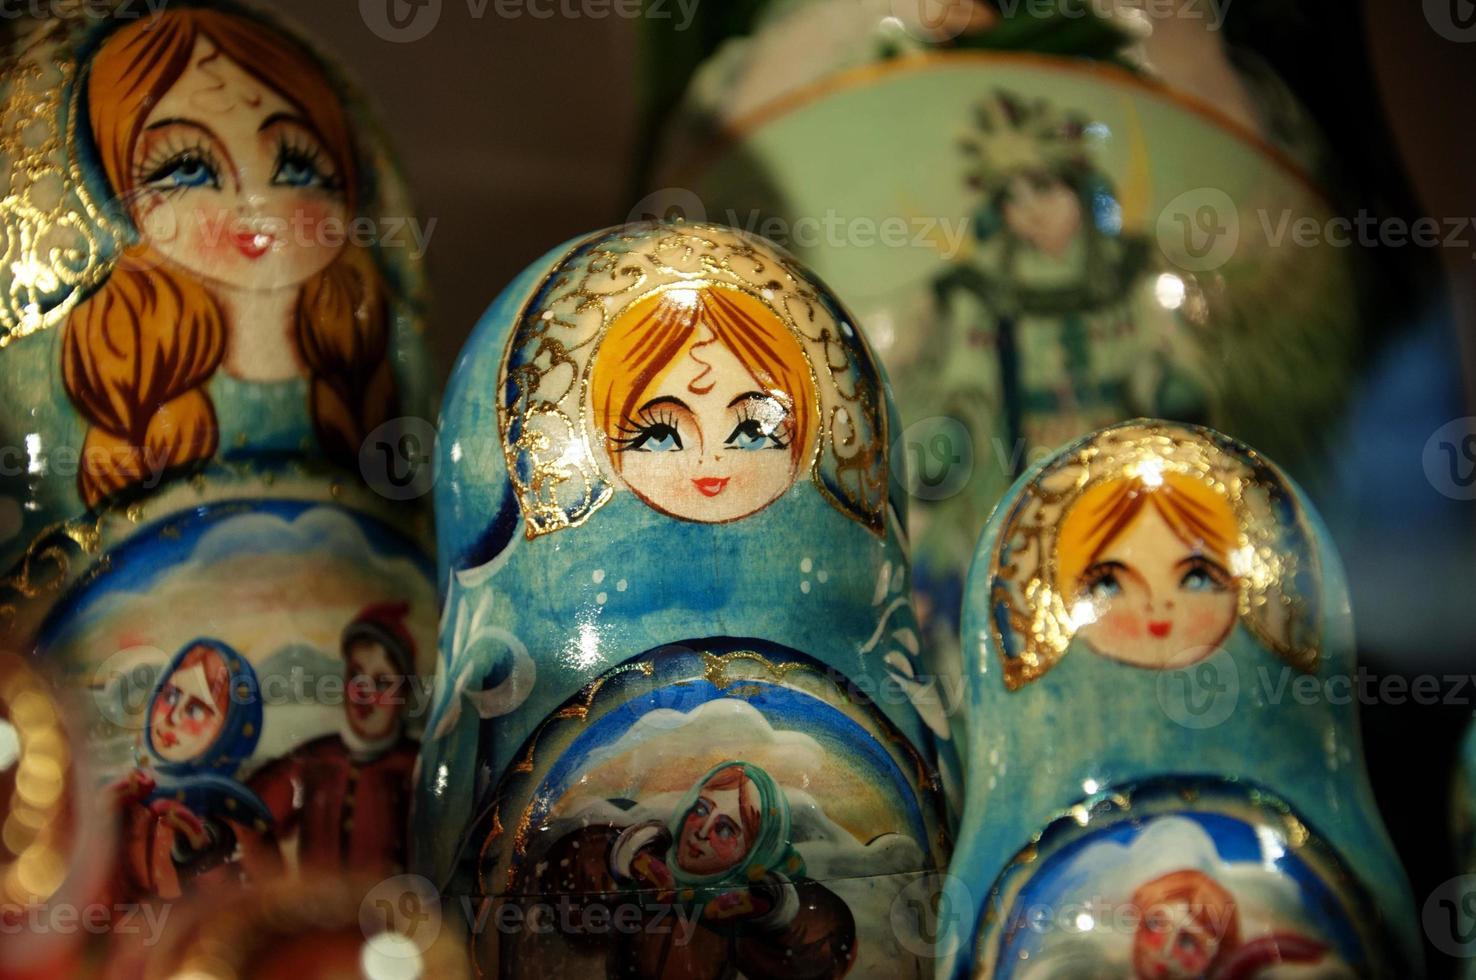 muñecas matryoshka foto